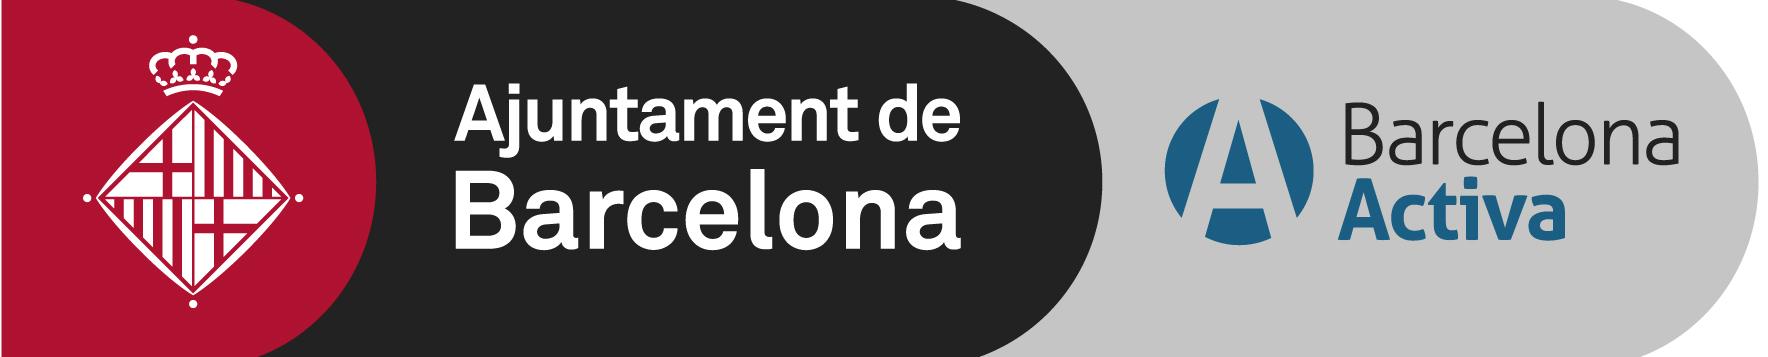 Logo Barcelona activa - Ajuntament de Barcelona